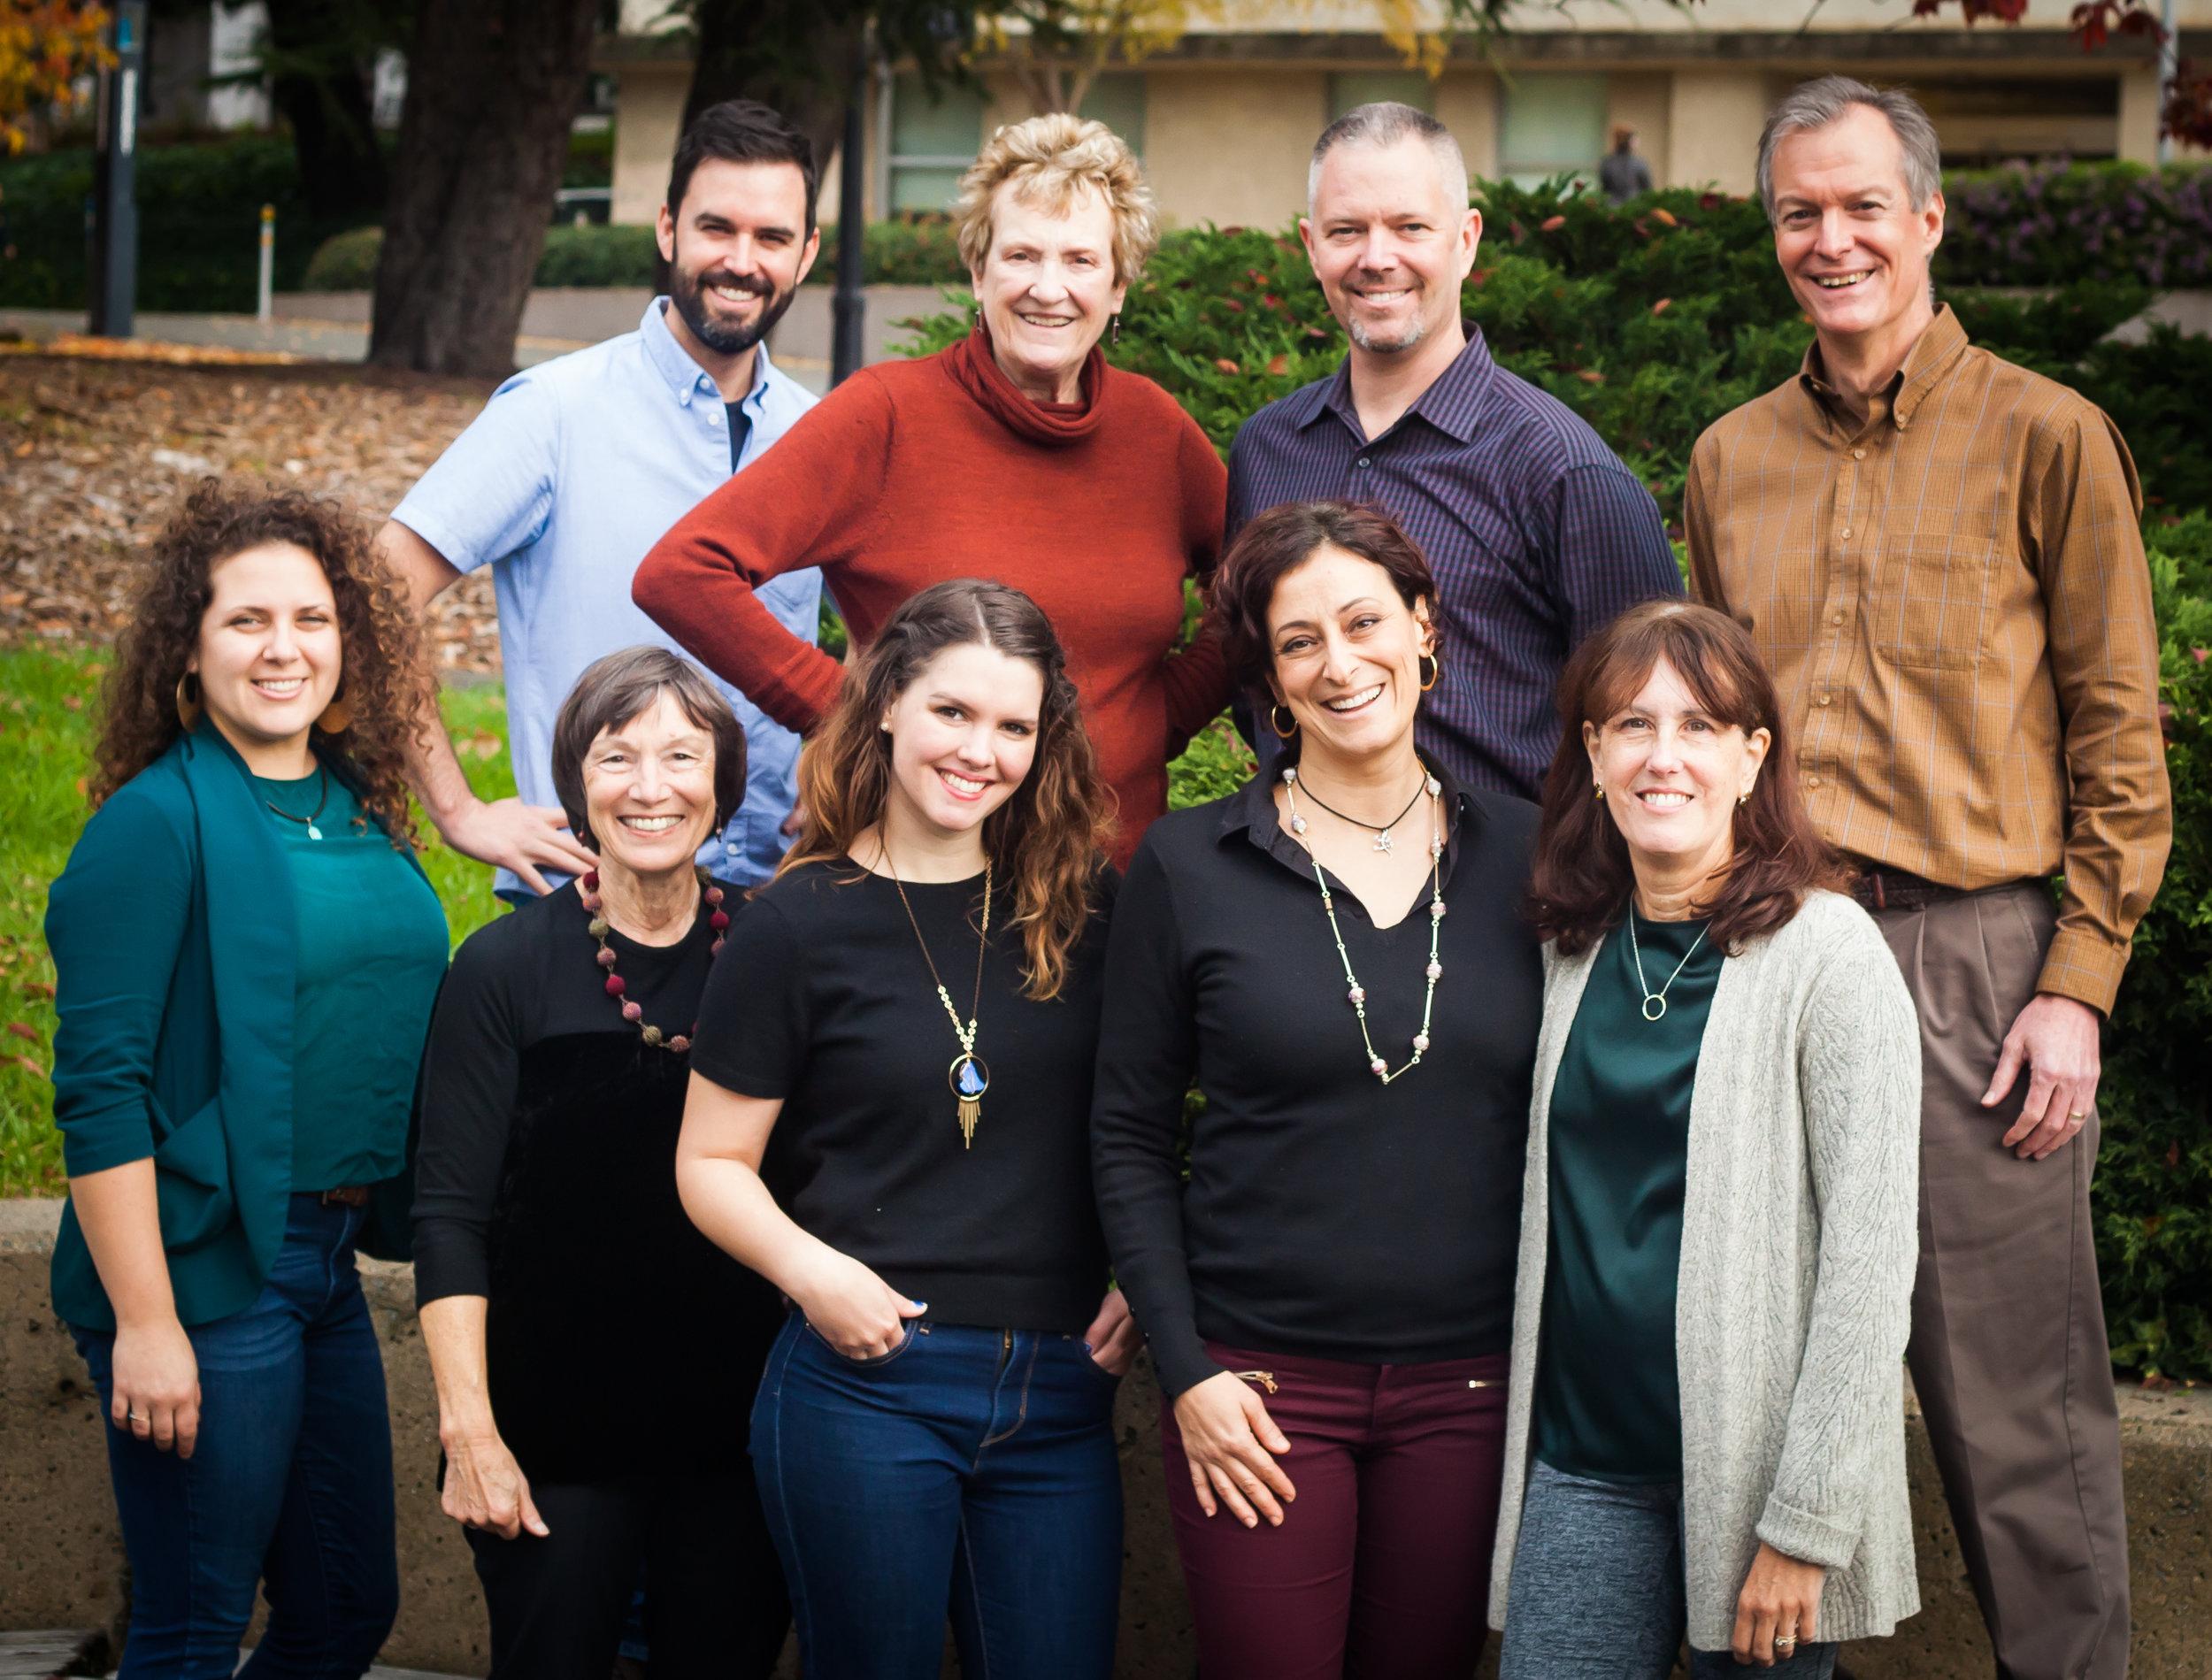 CoDA's team and board in December 2016  Front: (left to right) Lauren Matley, Meg Conkey, Kelley Shanahan, Cinzia Perlingieri, Robin Harper; Back:Michael Jennings, Ruth Tringham, Michael Ashley, Tim Gill